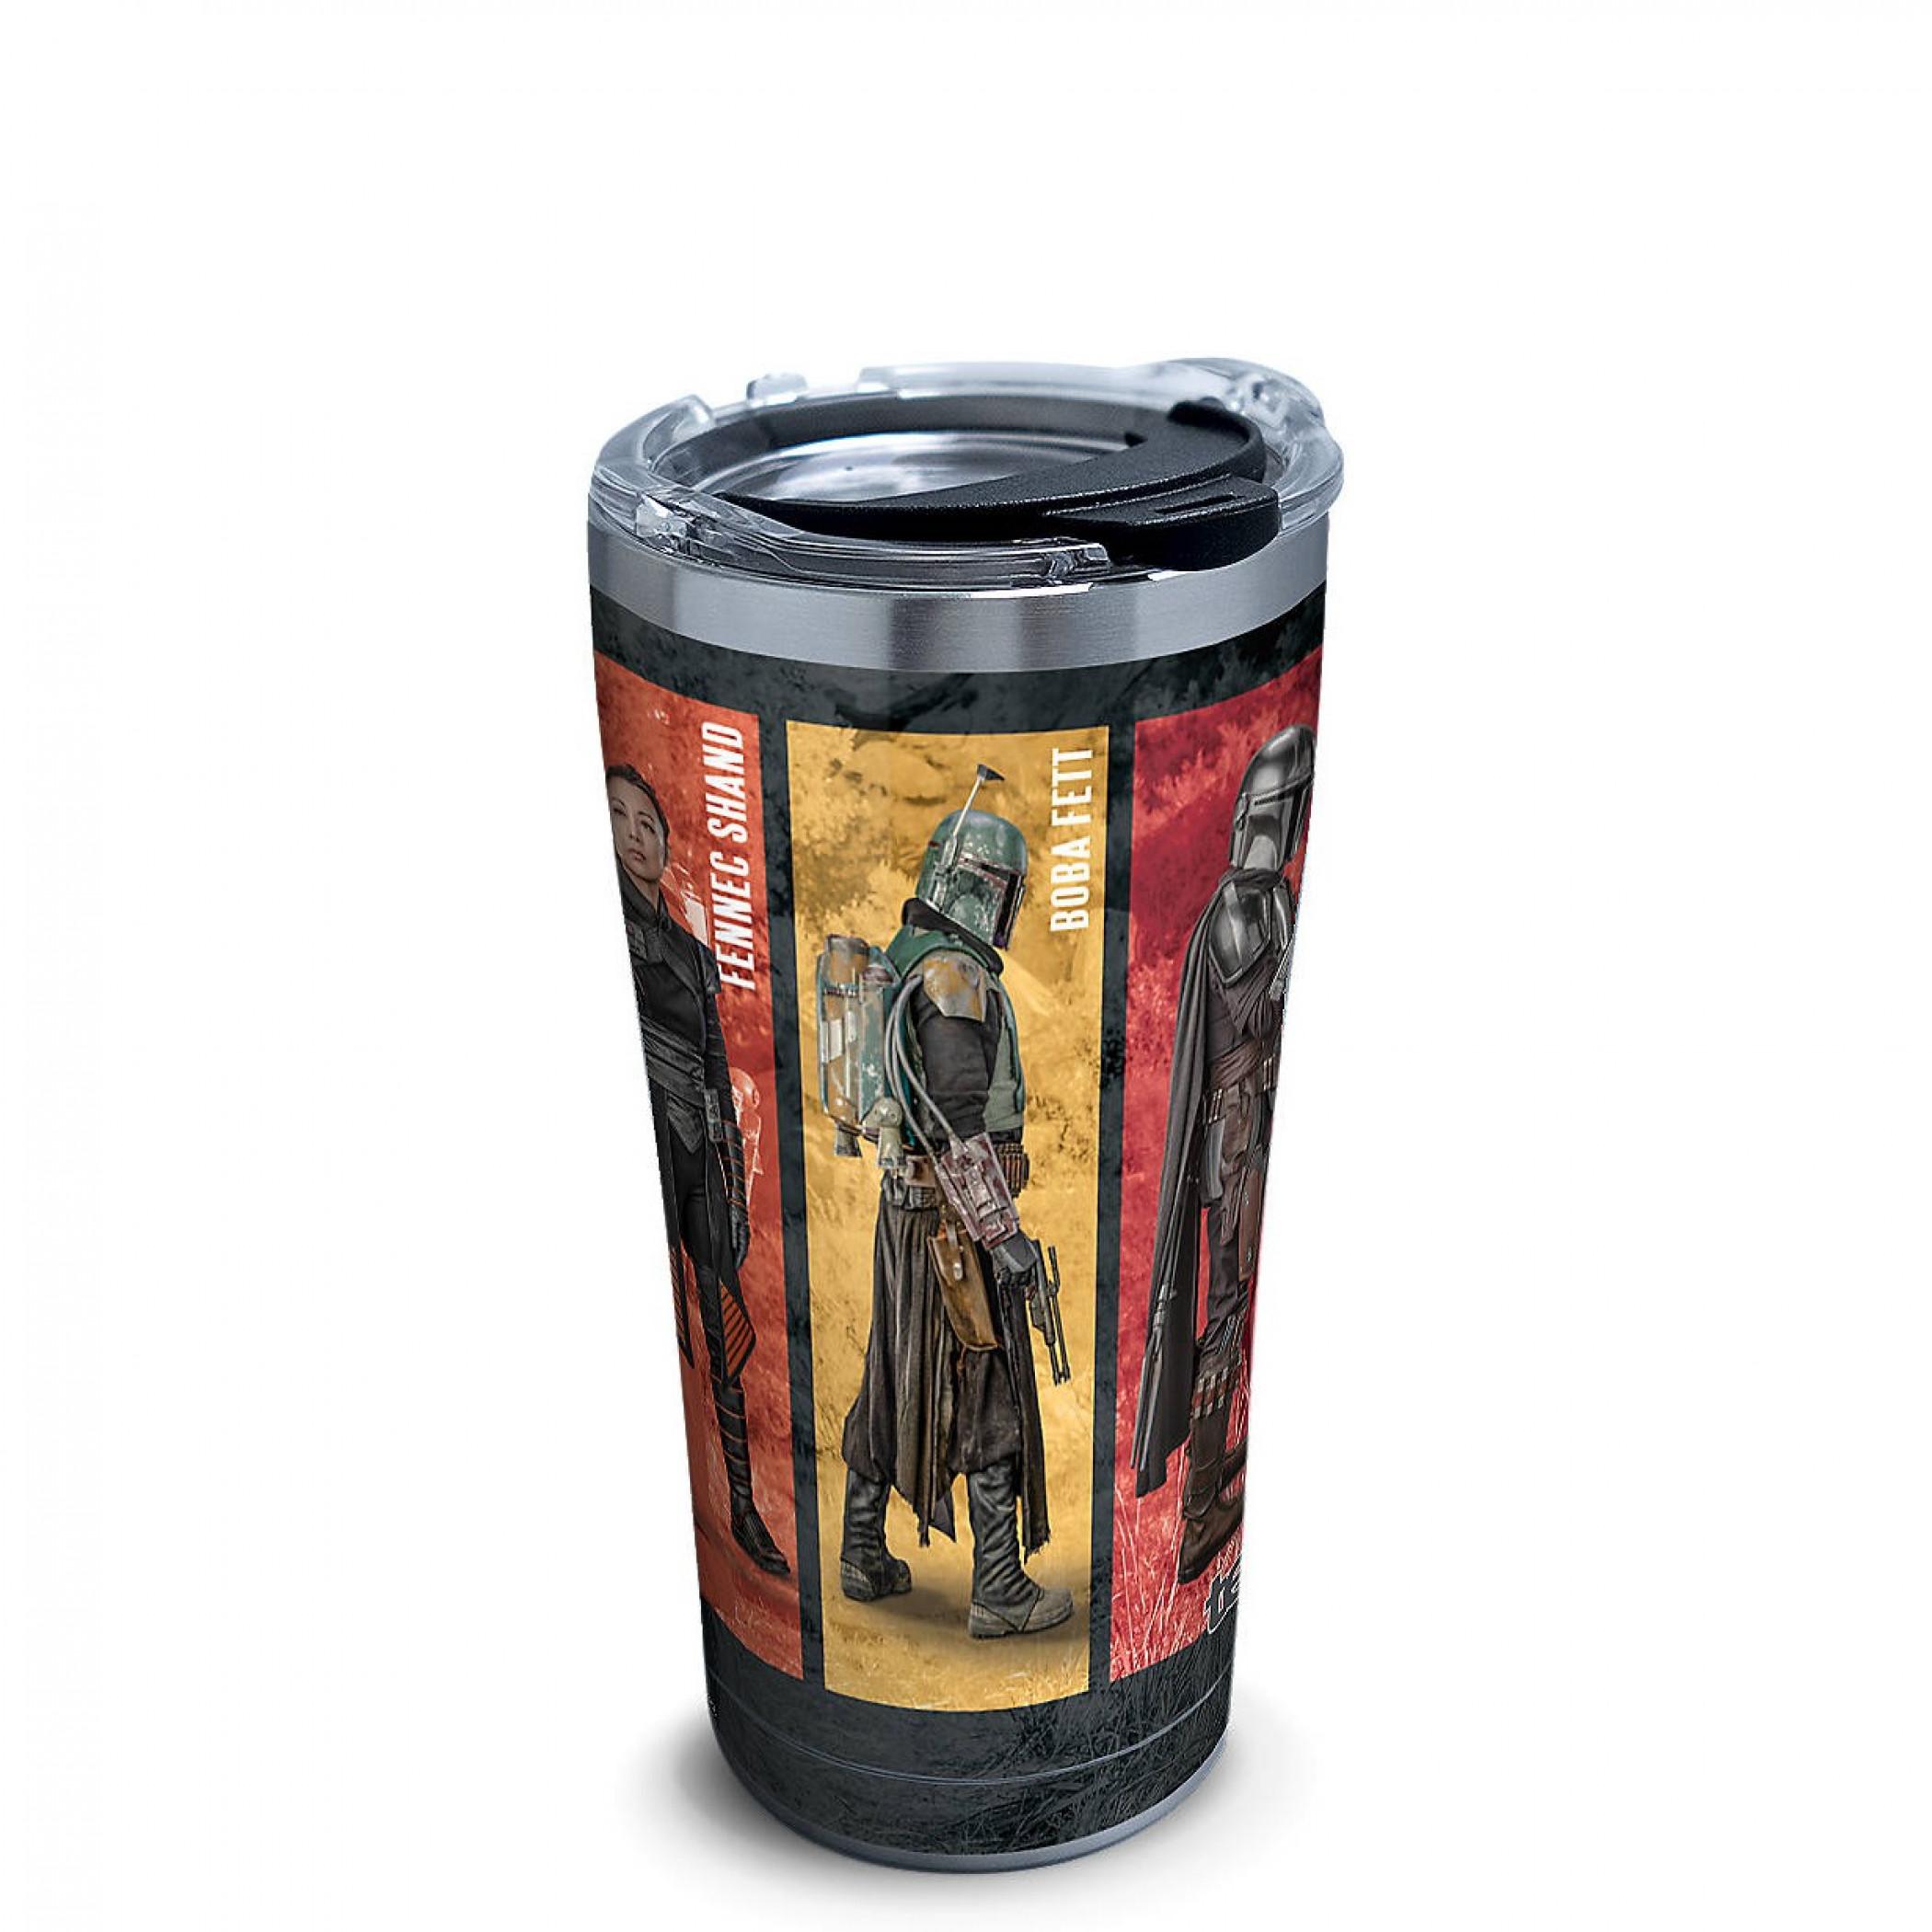 Star Wars The Mandalorian Chapter 14 Stainless Steel 20oz Travel Mug